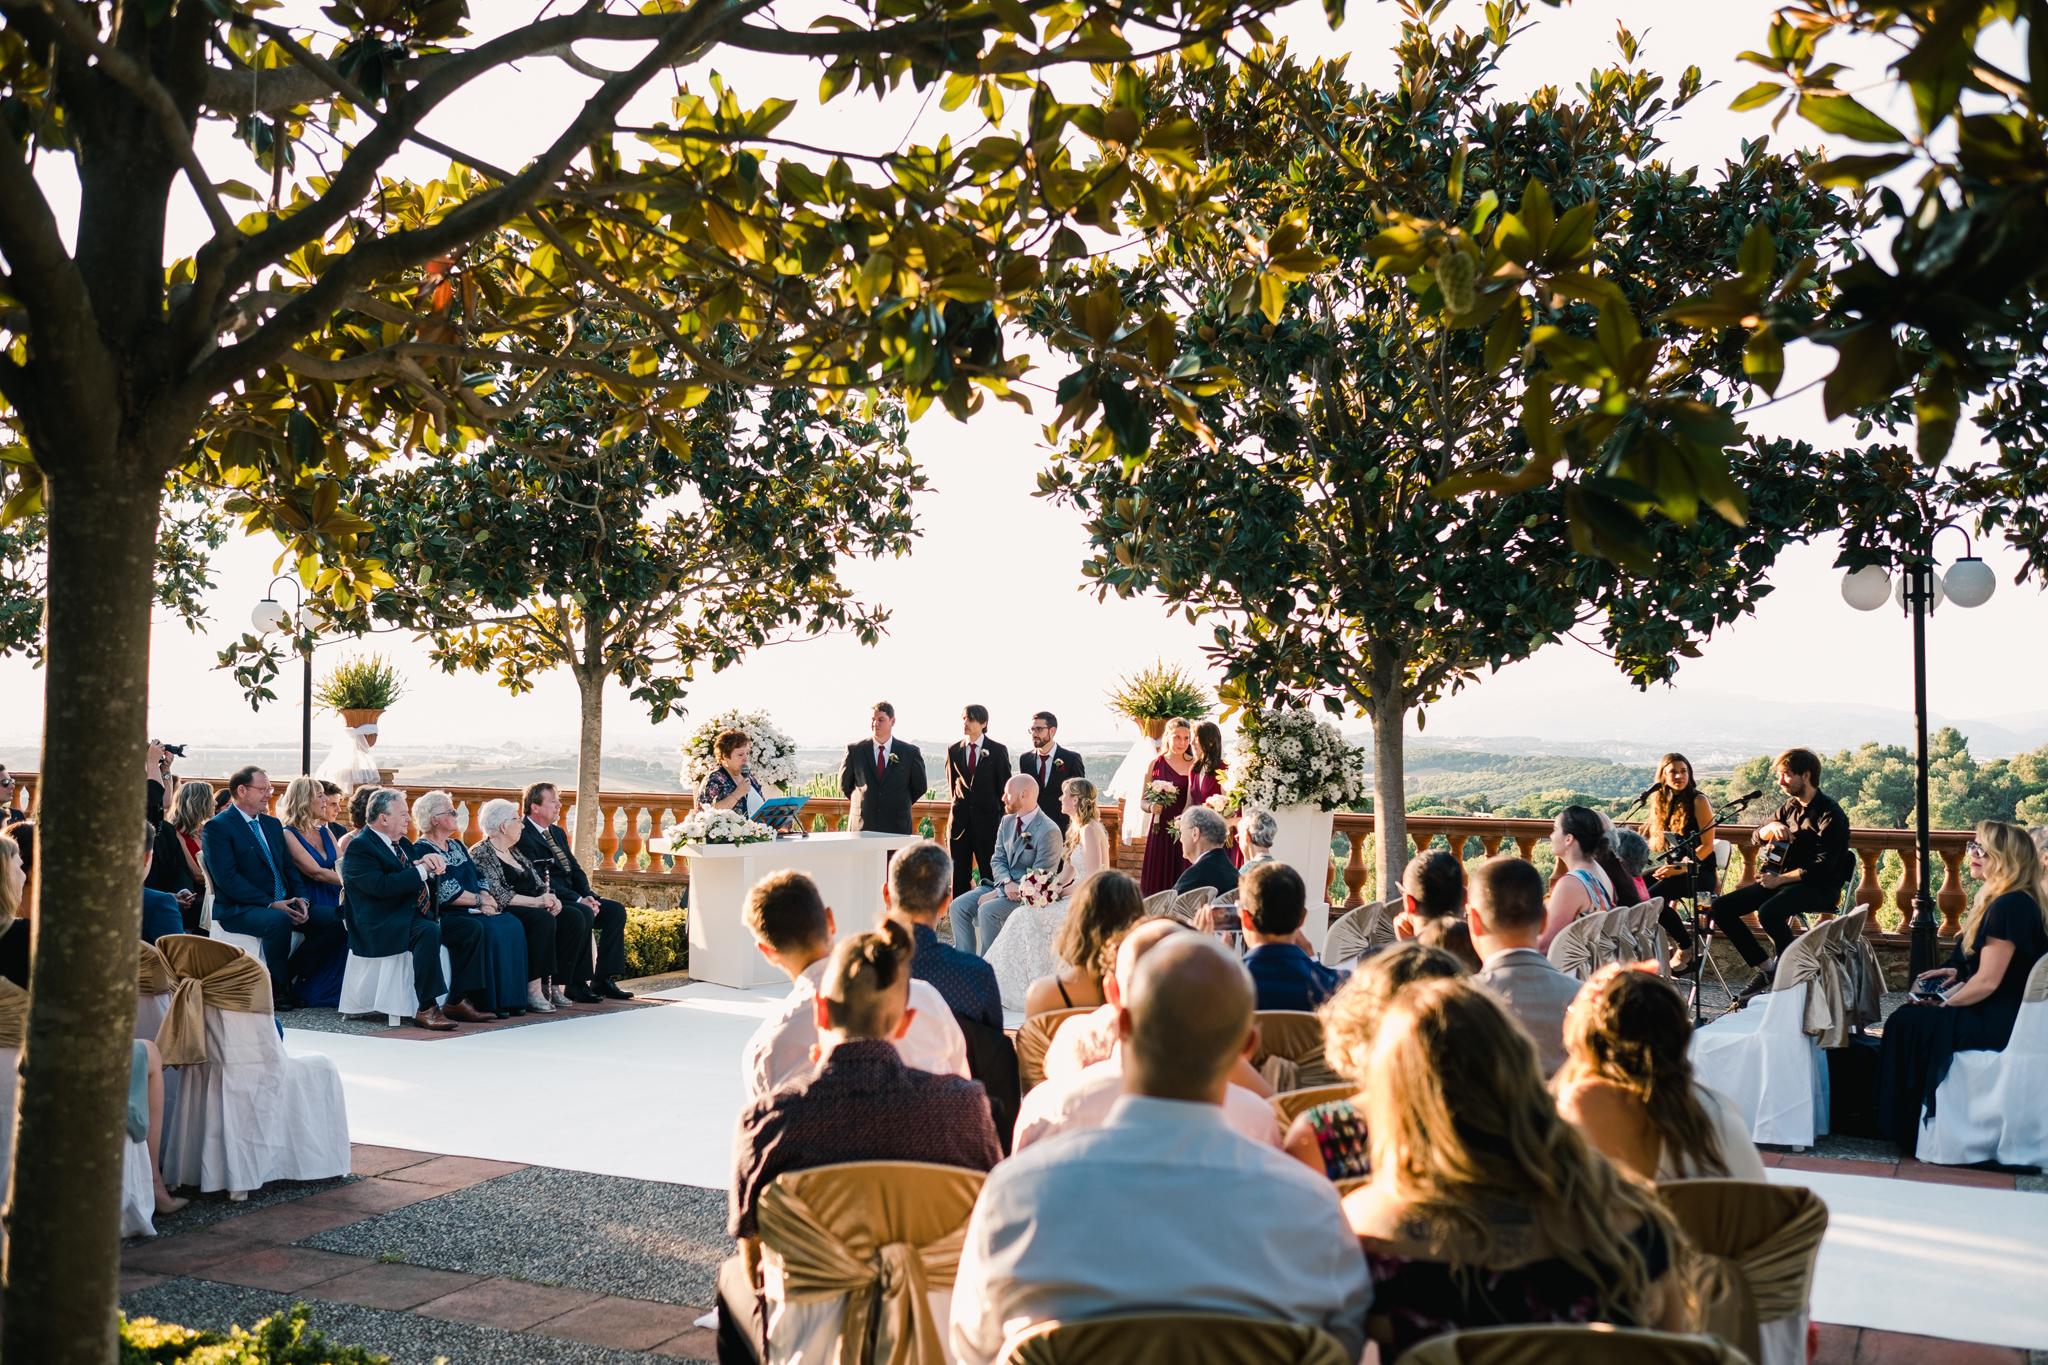 fotografia-boda-mas-sant-llei0032.jpg